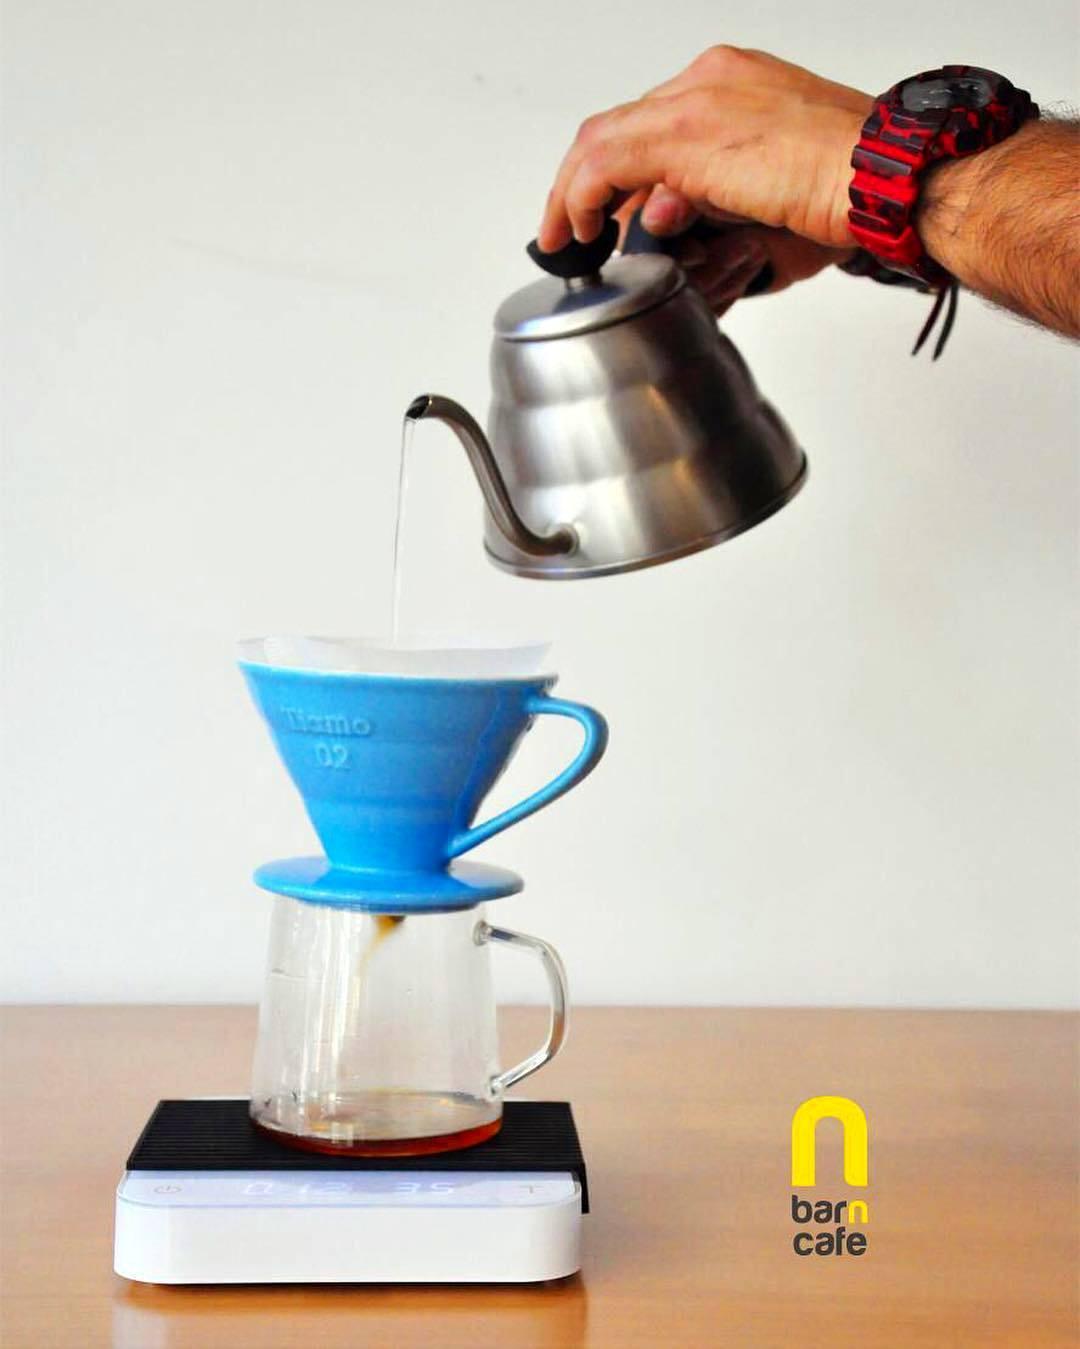 barn cafe cafeyab 11